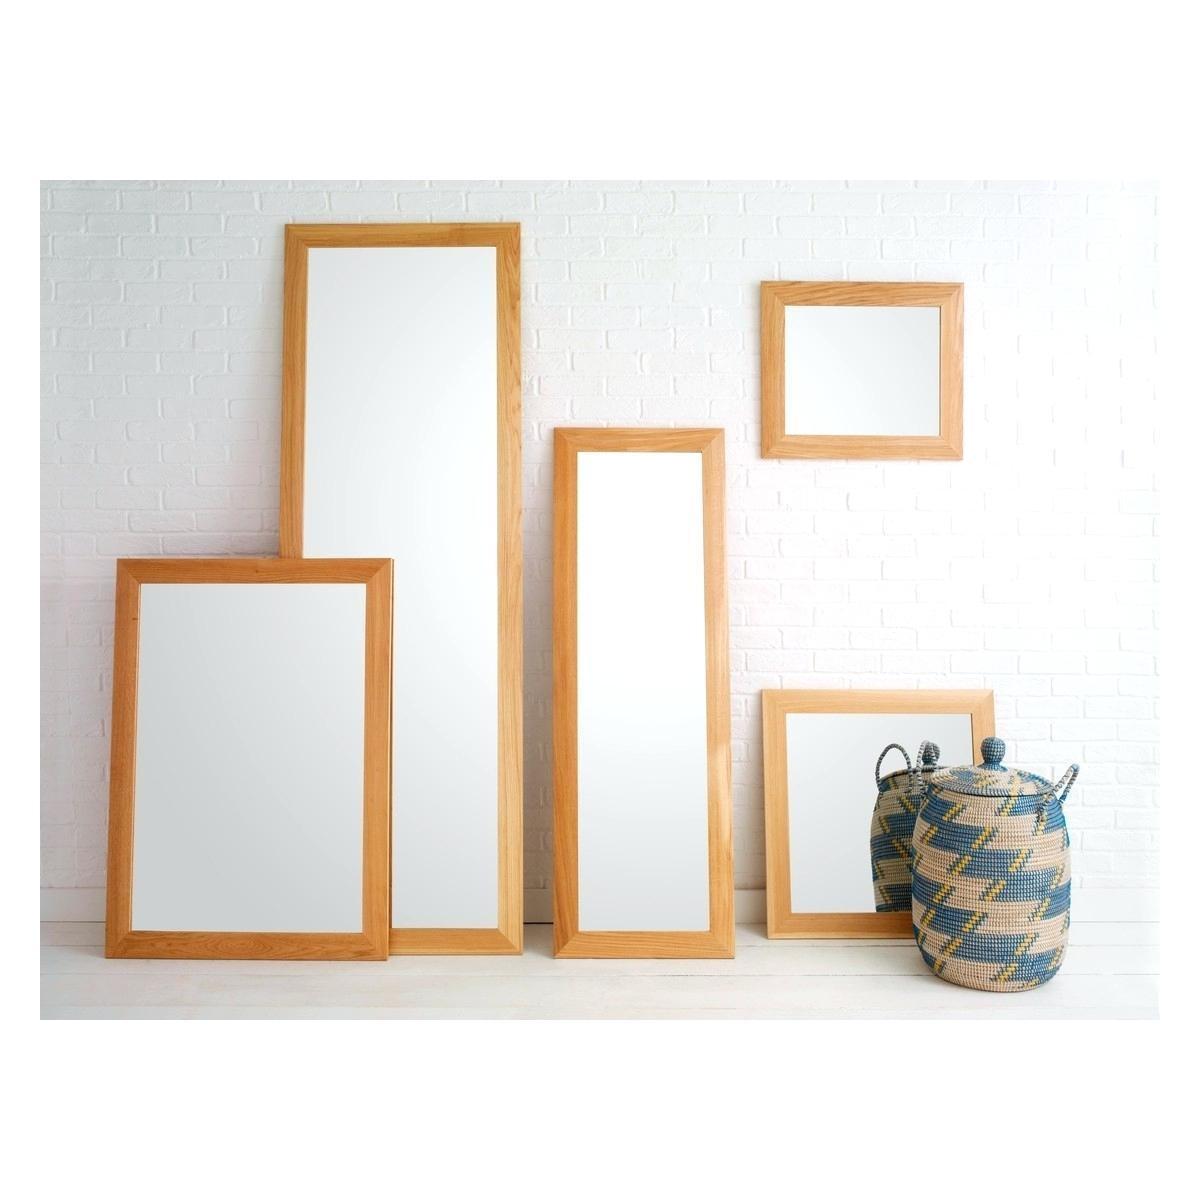 Wooden Full Length Mirroroak Framed Wall Mirror Oak – Shopwiz For Large Oak Mirrors (View 9 of 20)